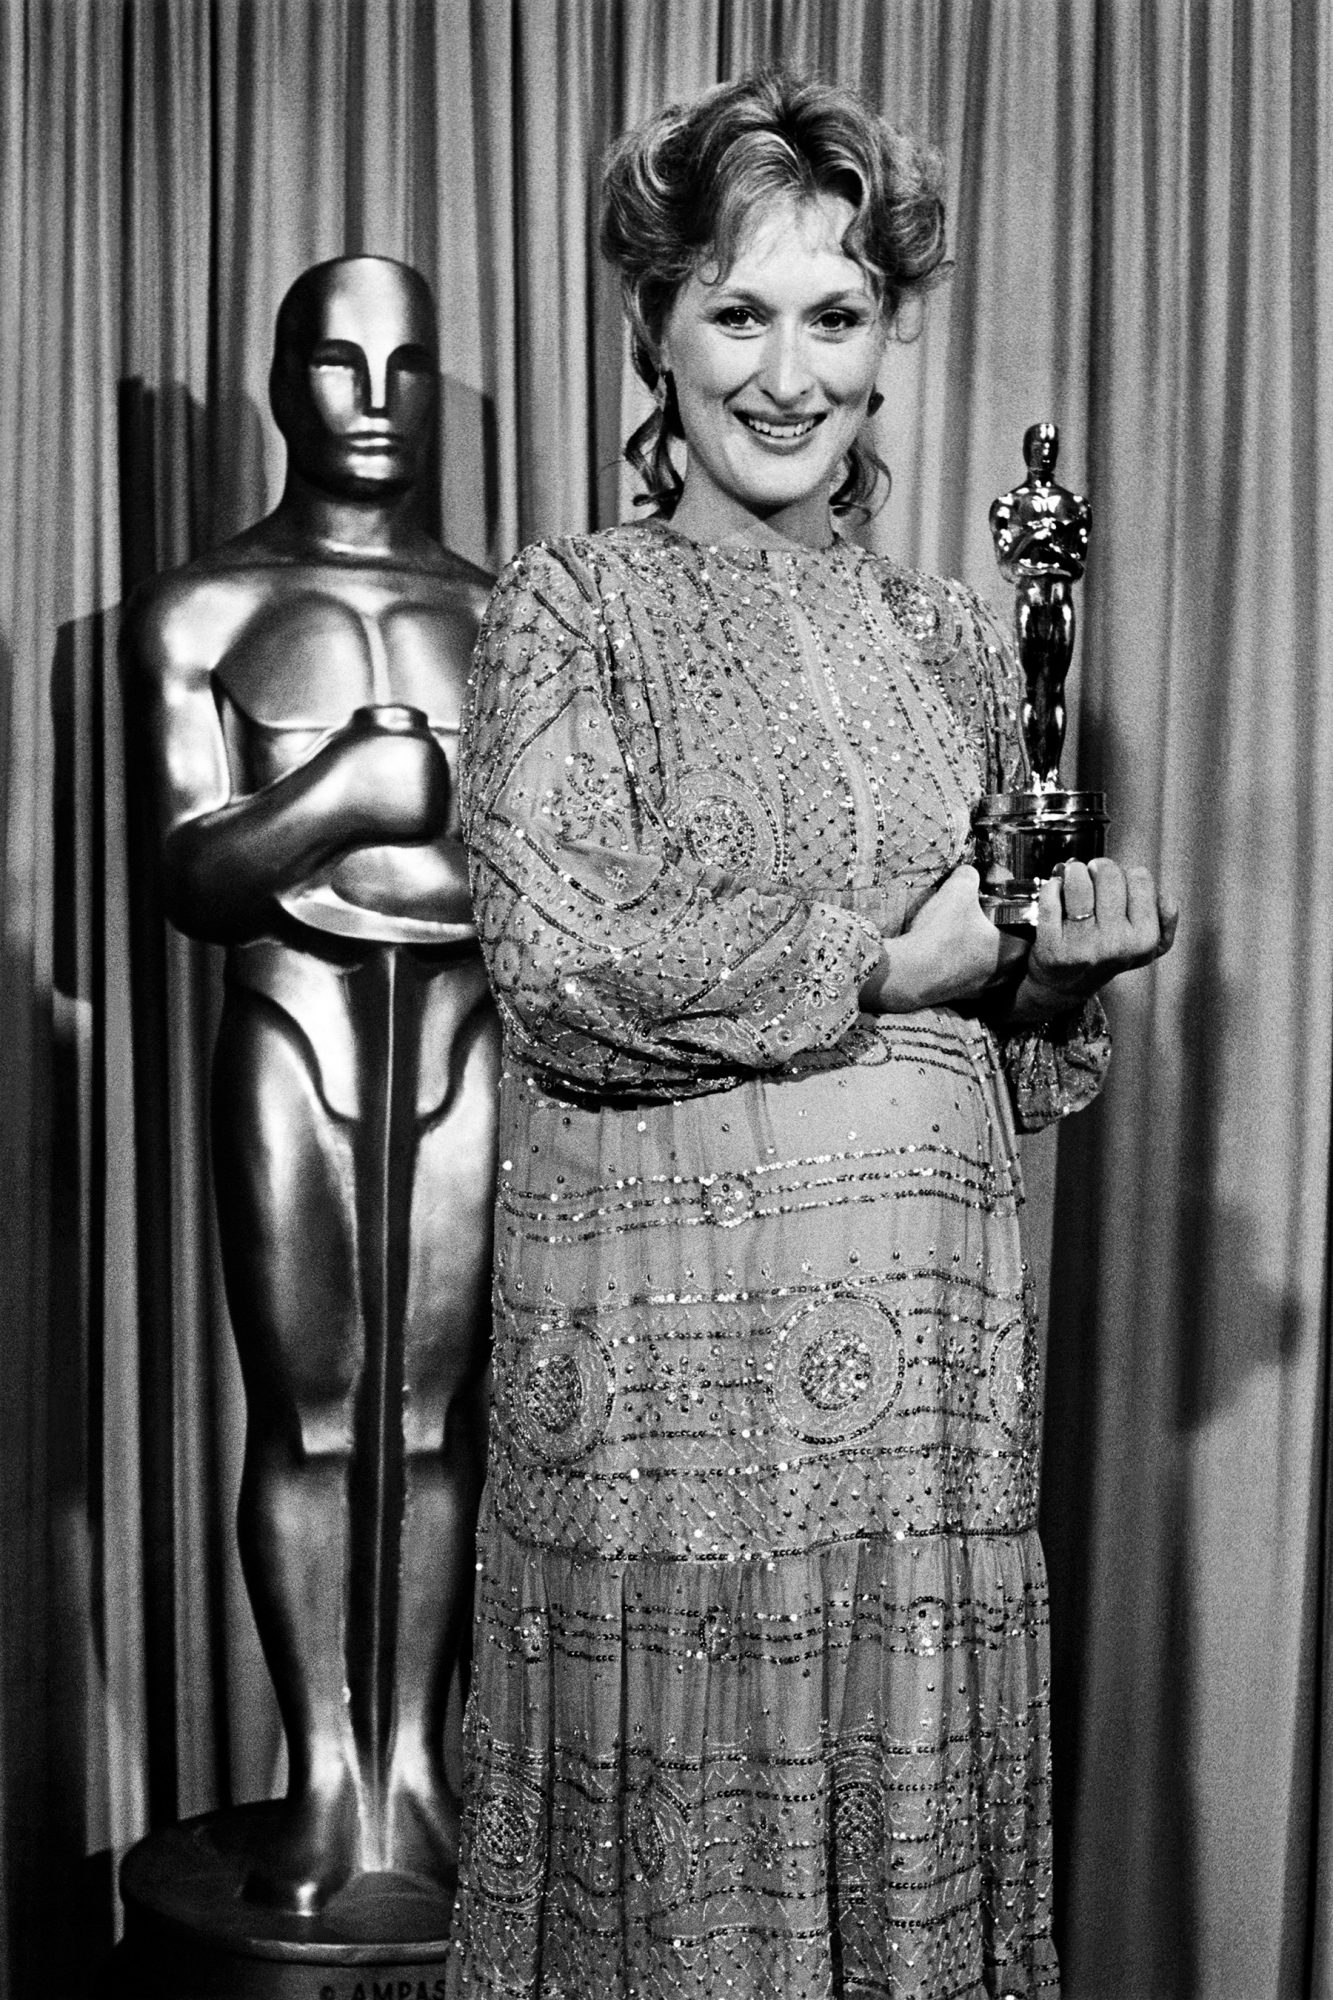 Meryl Streep Win Academy Award